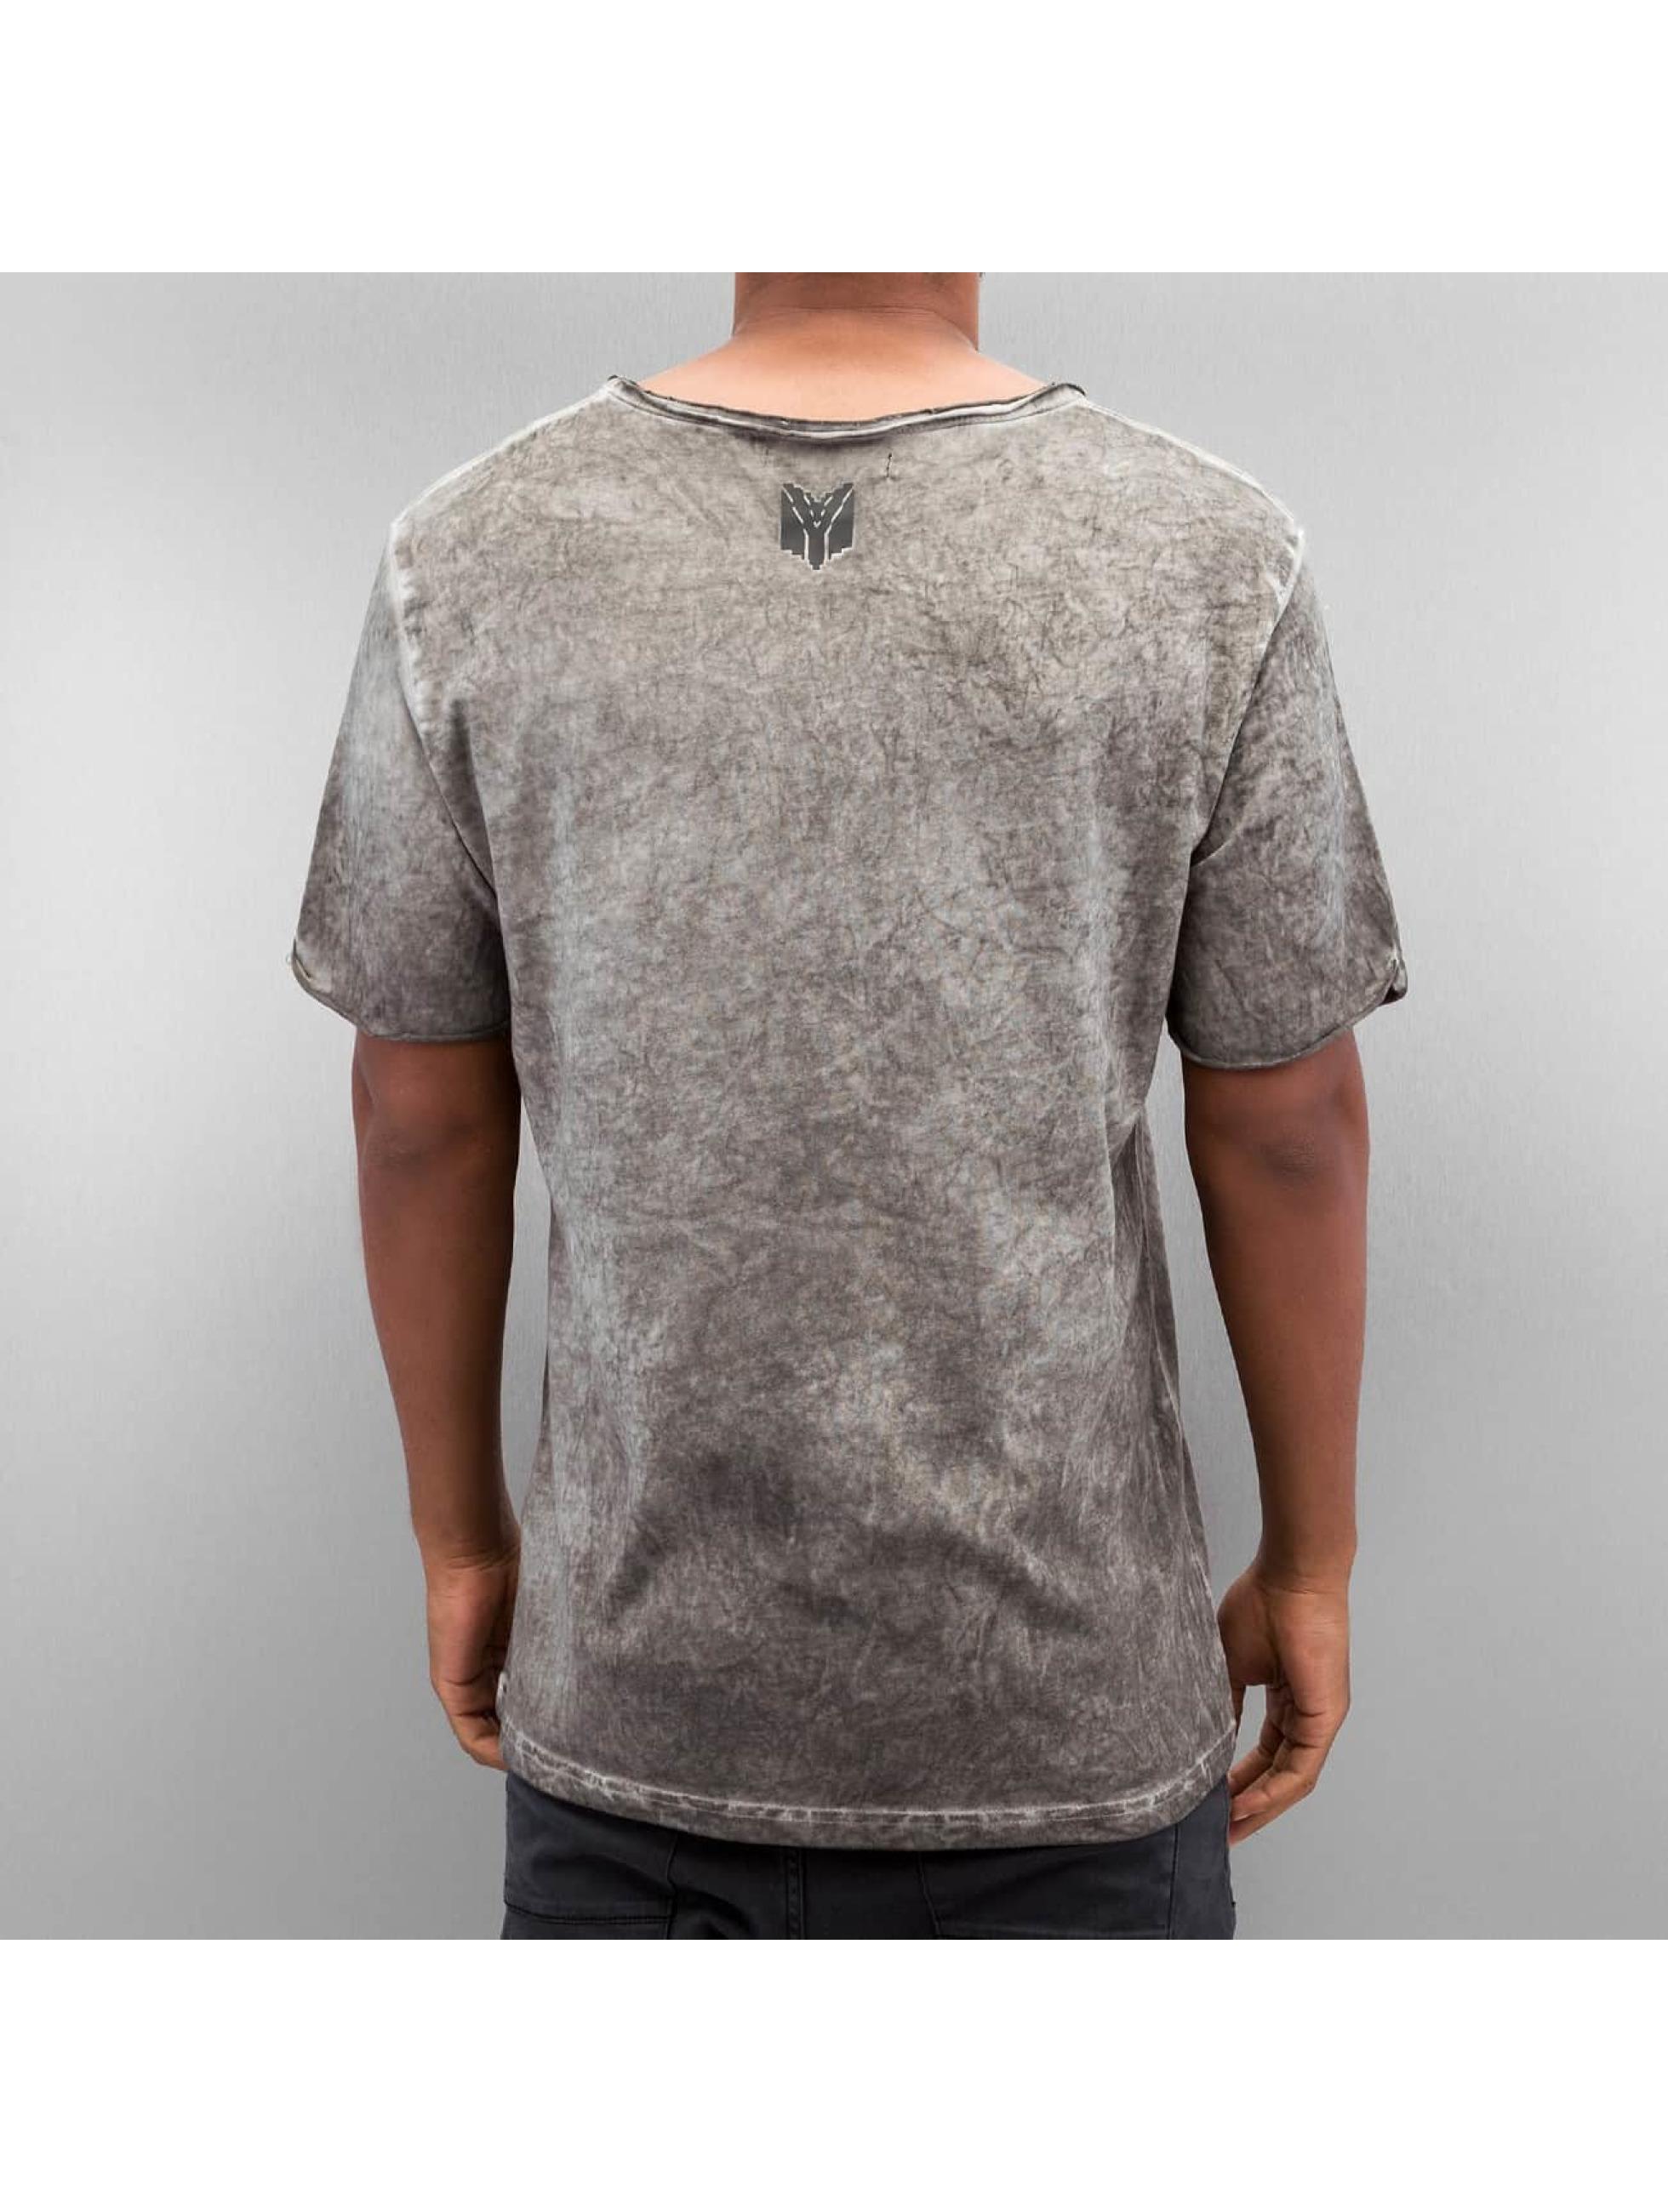 Yezz T-Shirt Washed gris